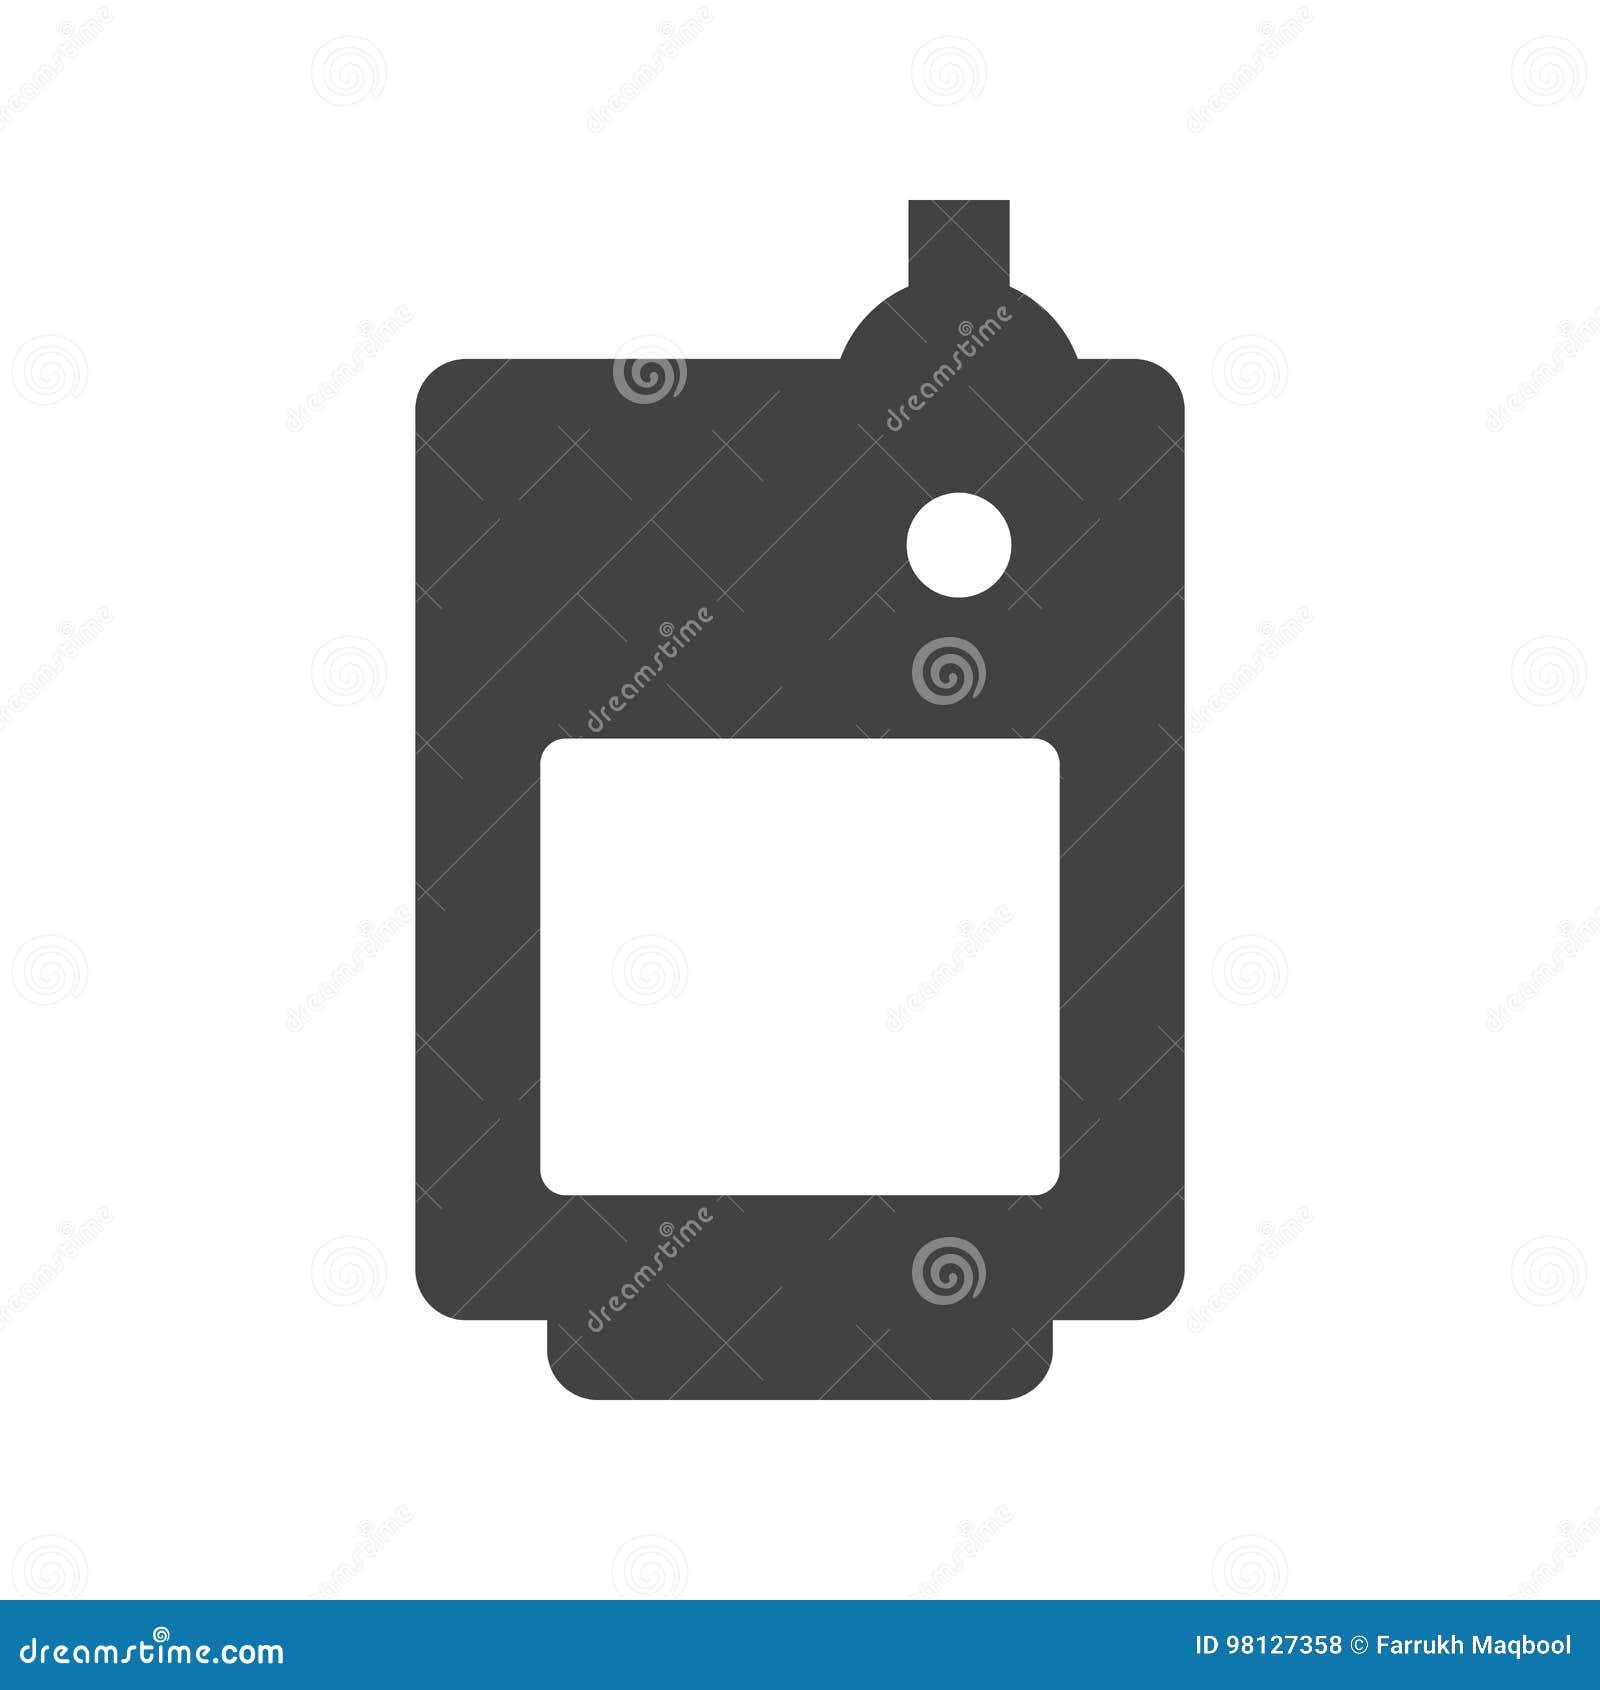 Solid Fuel Boiler stock vector. Illustration of winter - 98127358